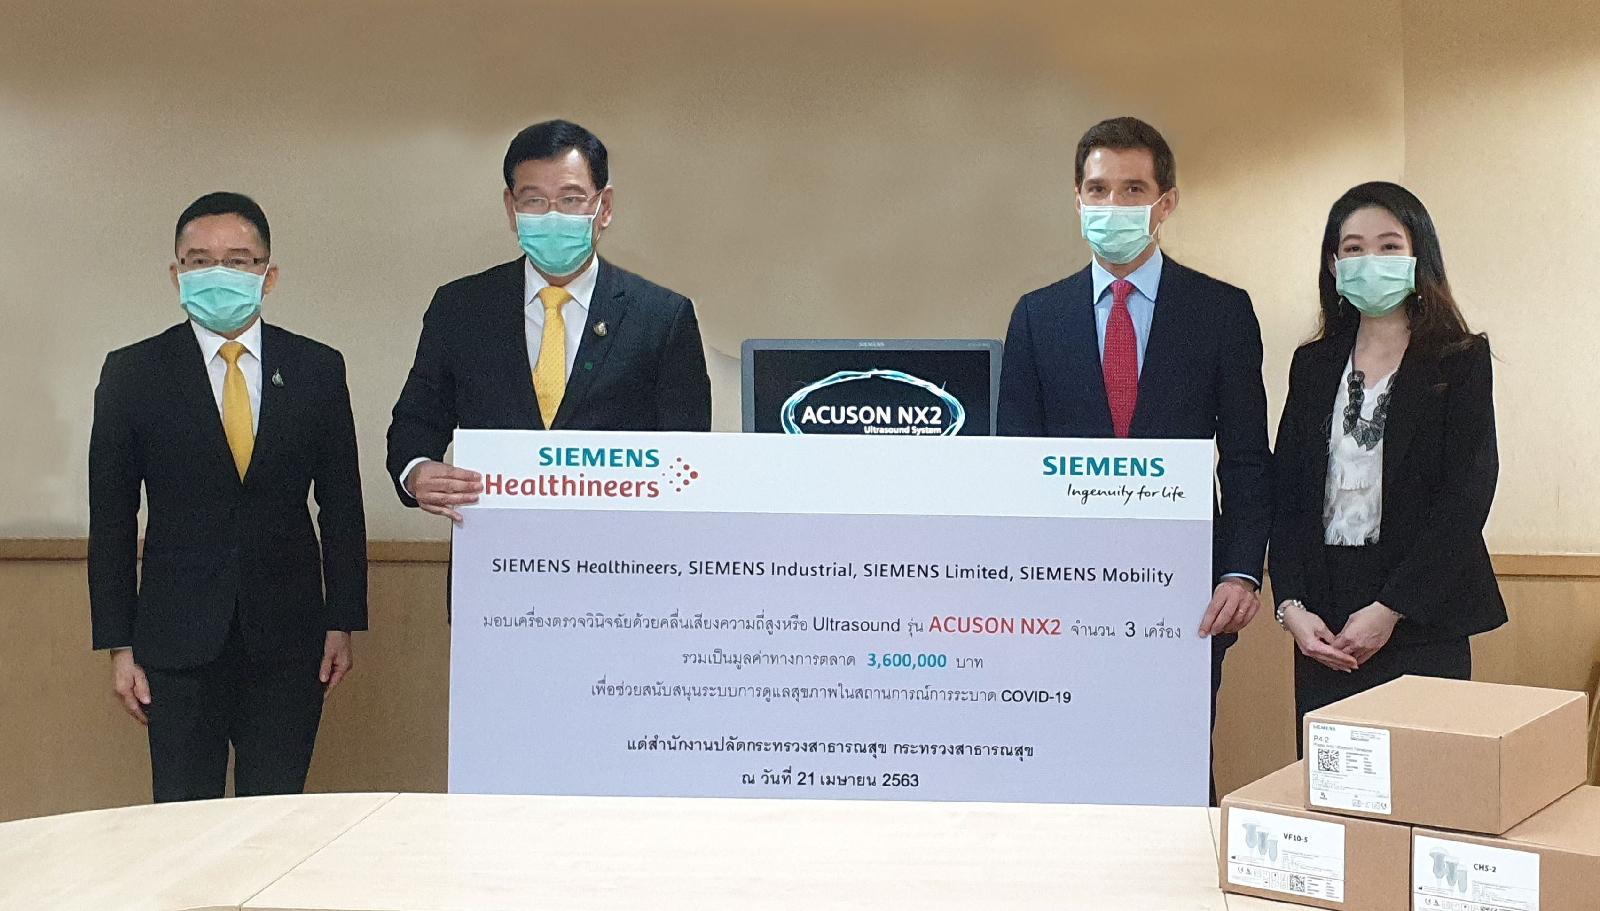 Siemens ในประเทศไทย เดินหน้าหนุนทีมแพทย์ร่วมสู้ COVID-19 ด้วยการบริจาคเครื่องอัลตราซาวด์